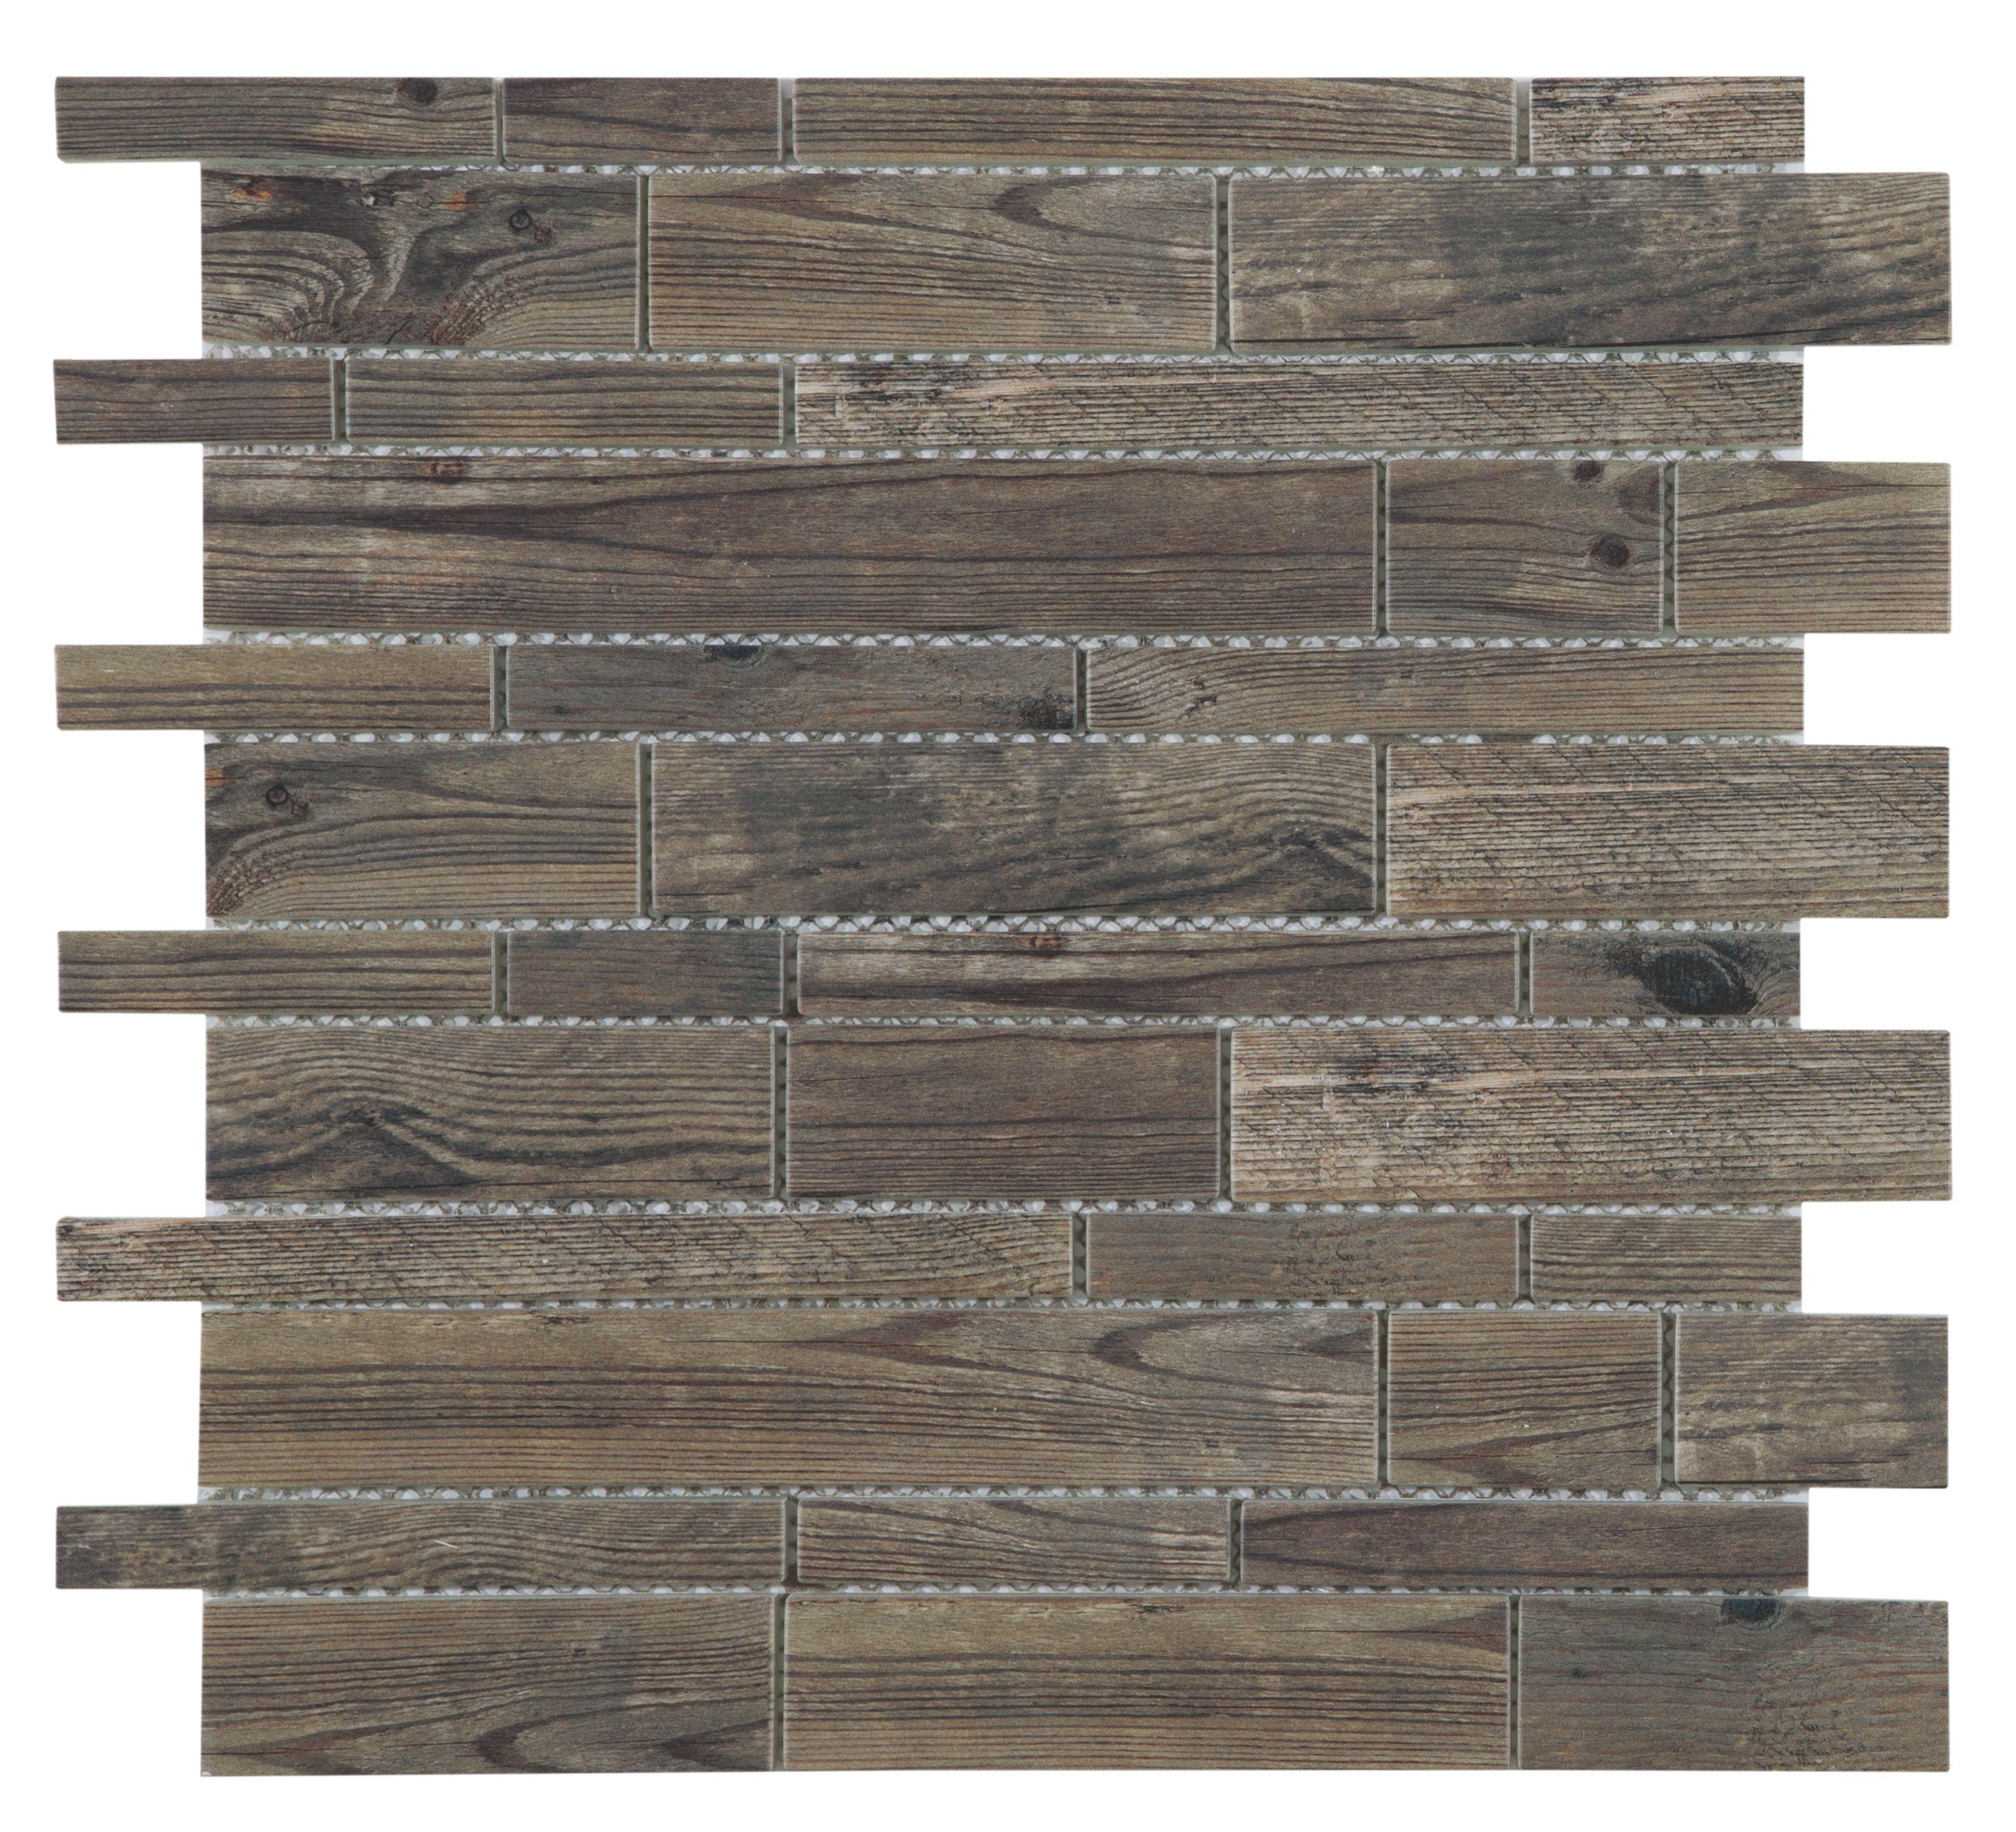 lampang wood effect glass mosaic tile l 302mm w 298mm. Black Bedroom Furniture Sets. Home Design Ideas